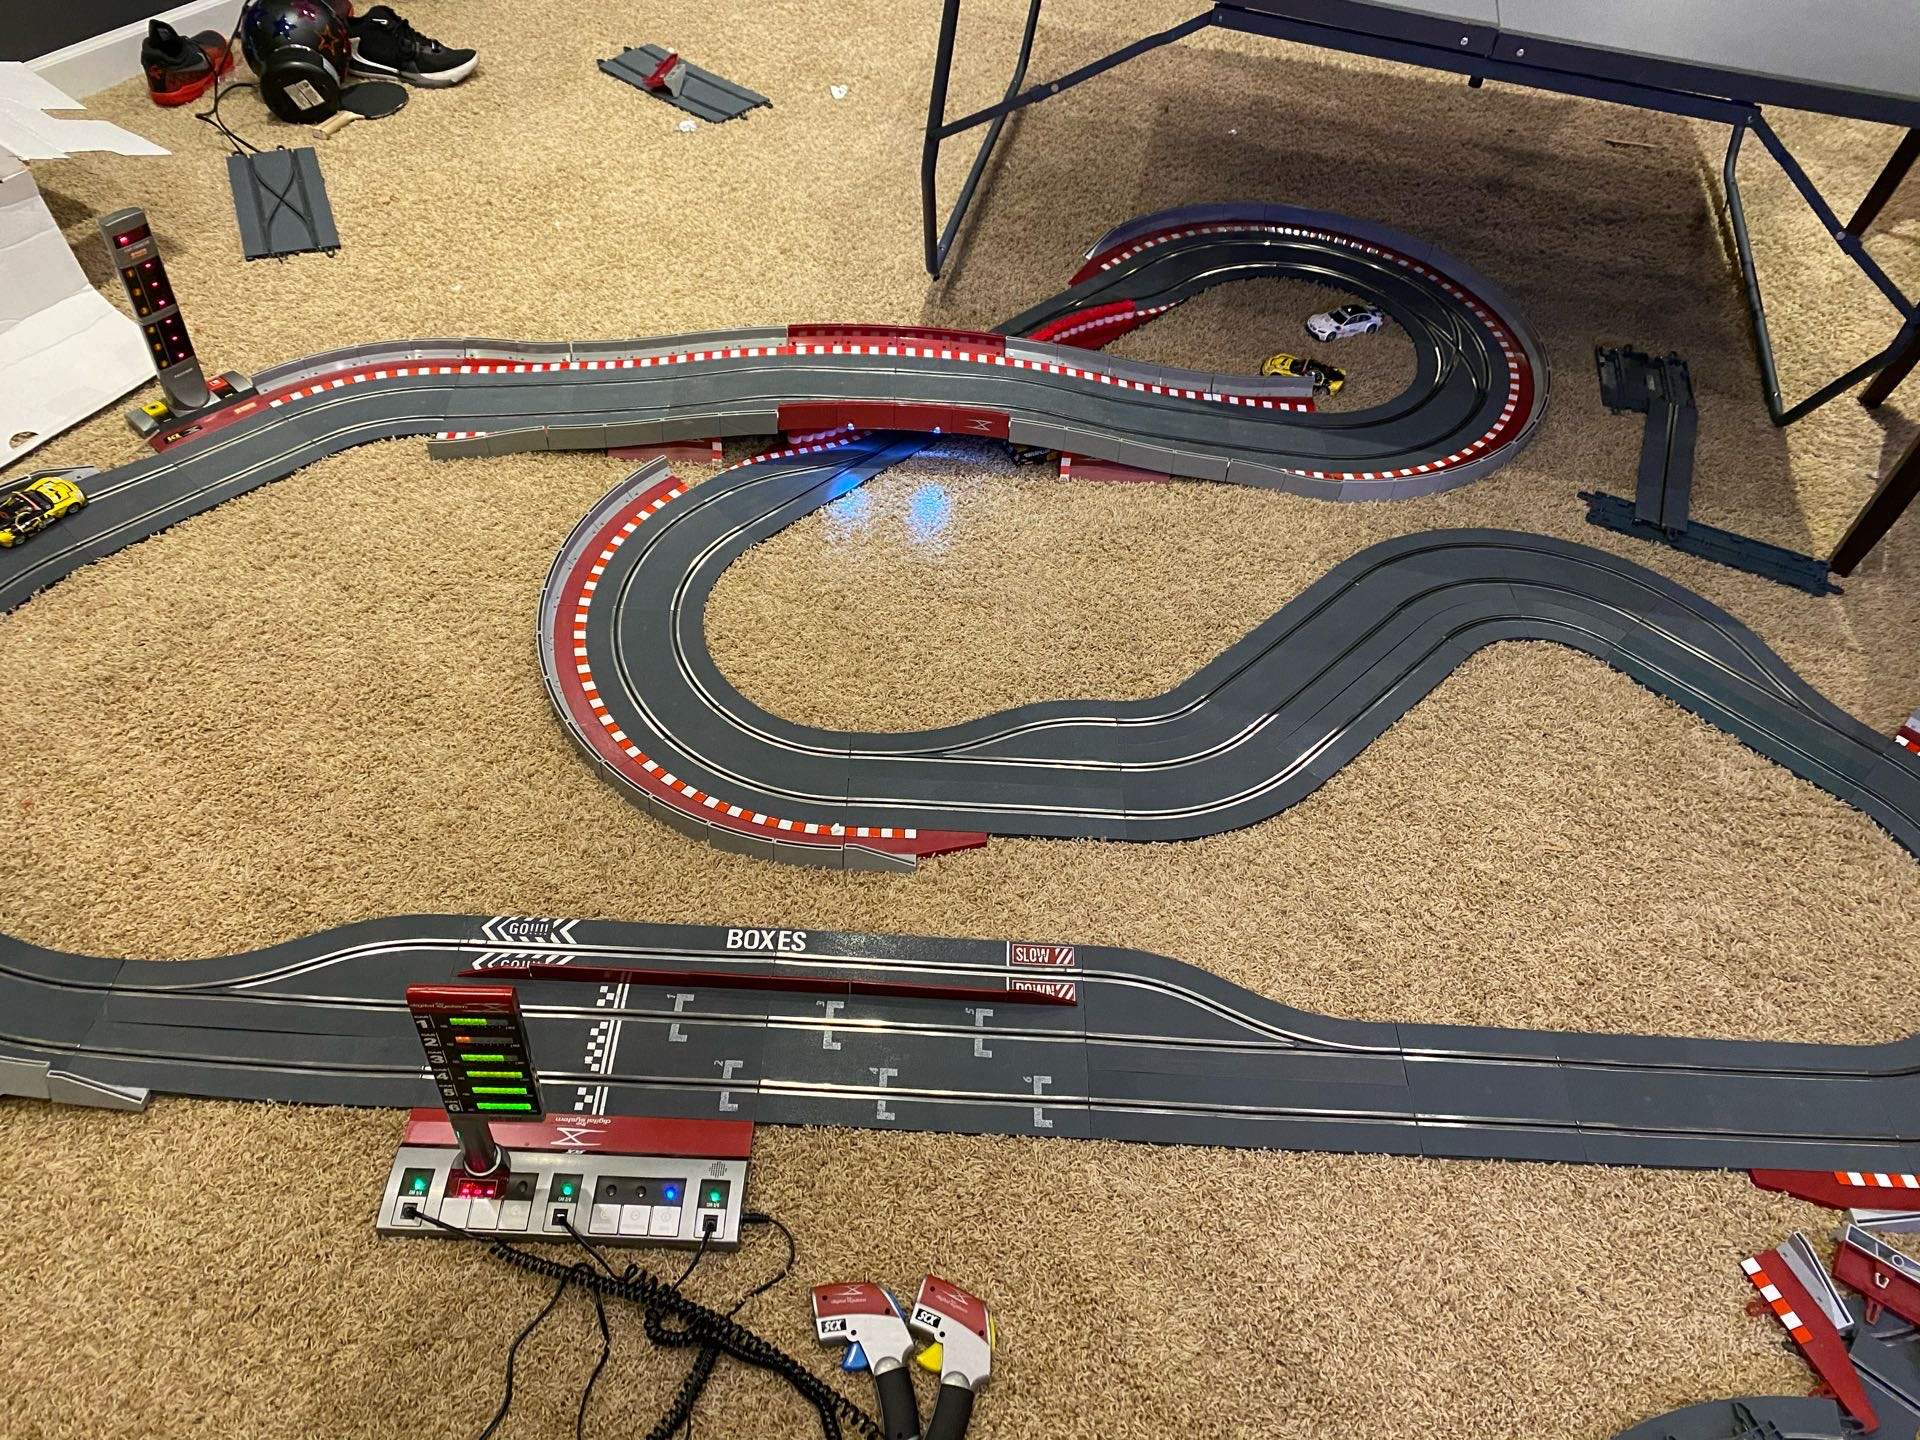 scx digital slot car track